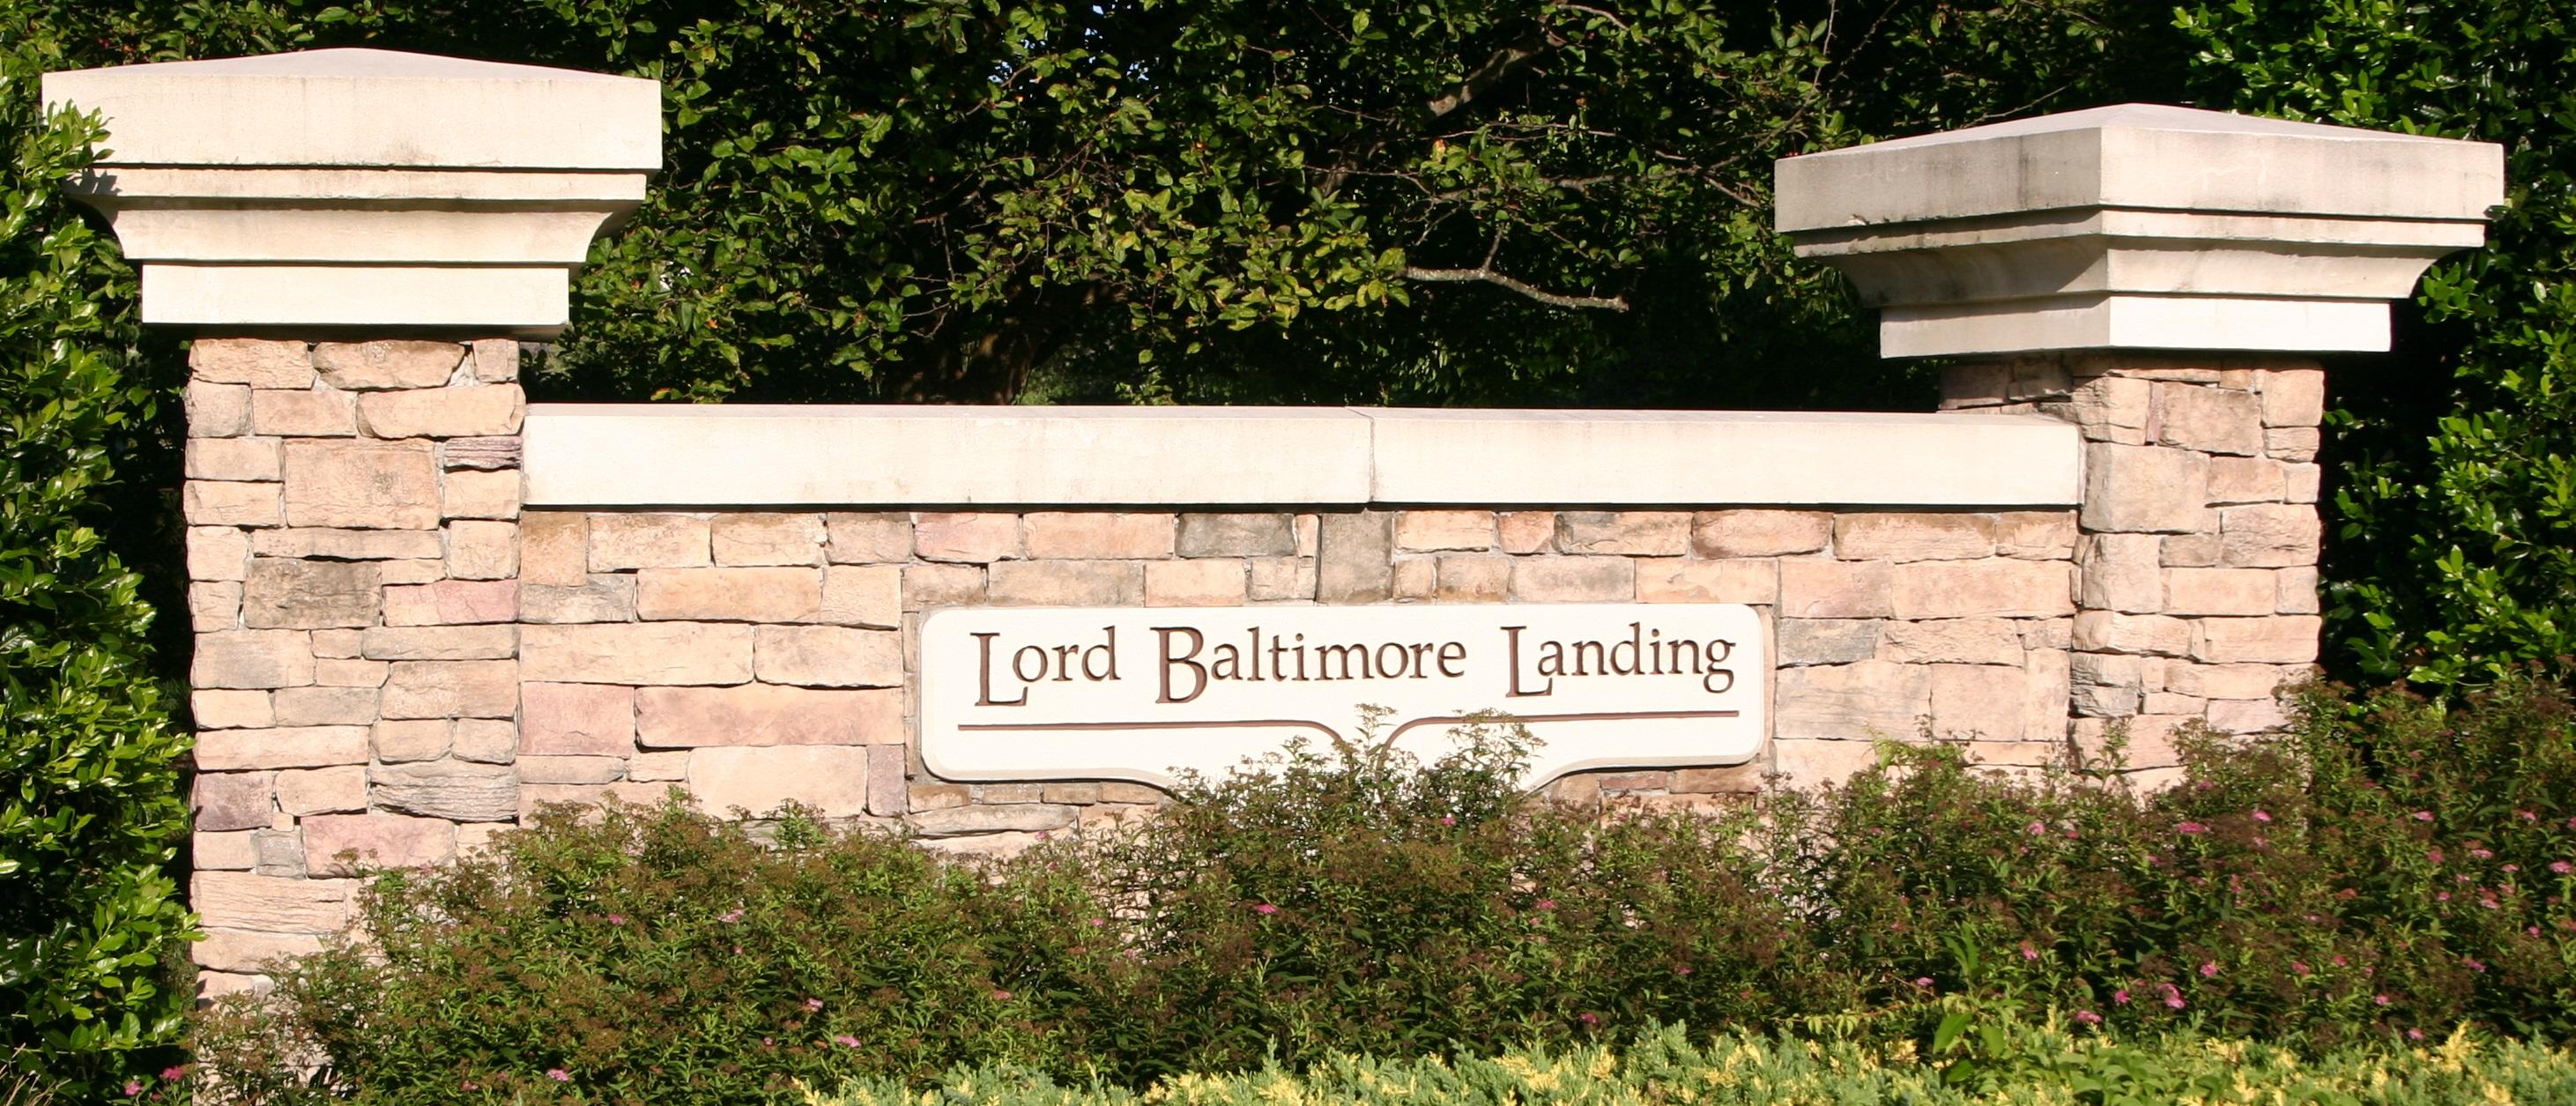 Lord Baltimore Landing HOA cover